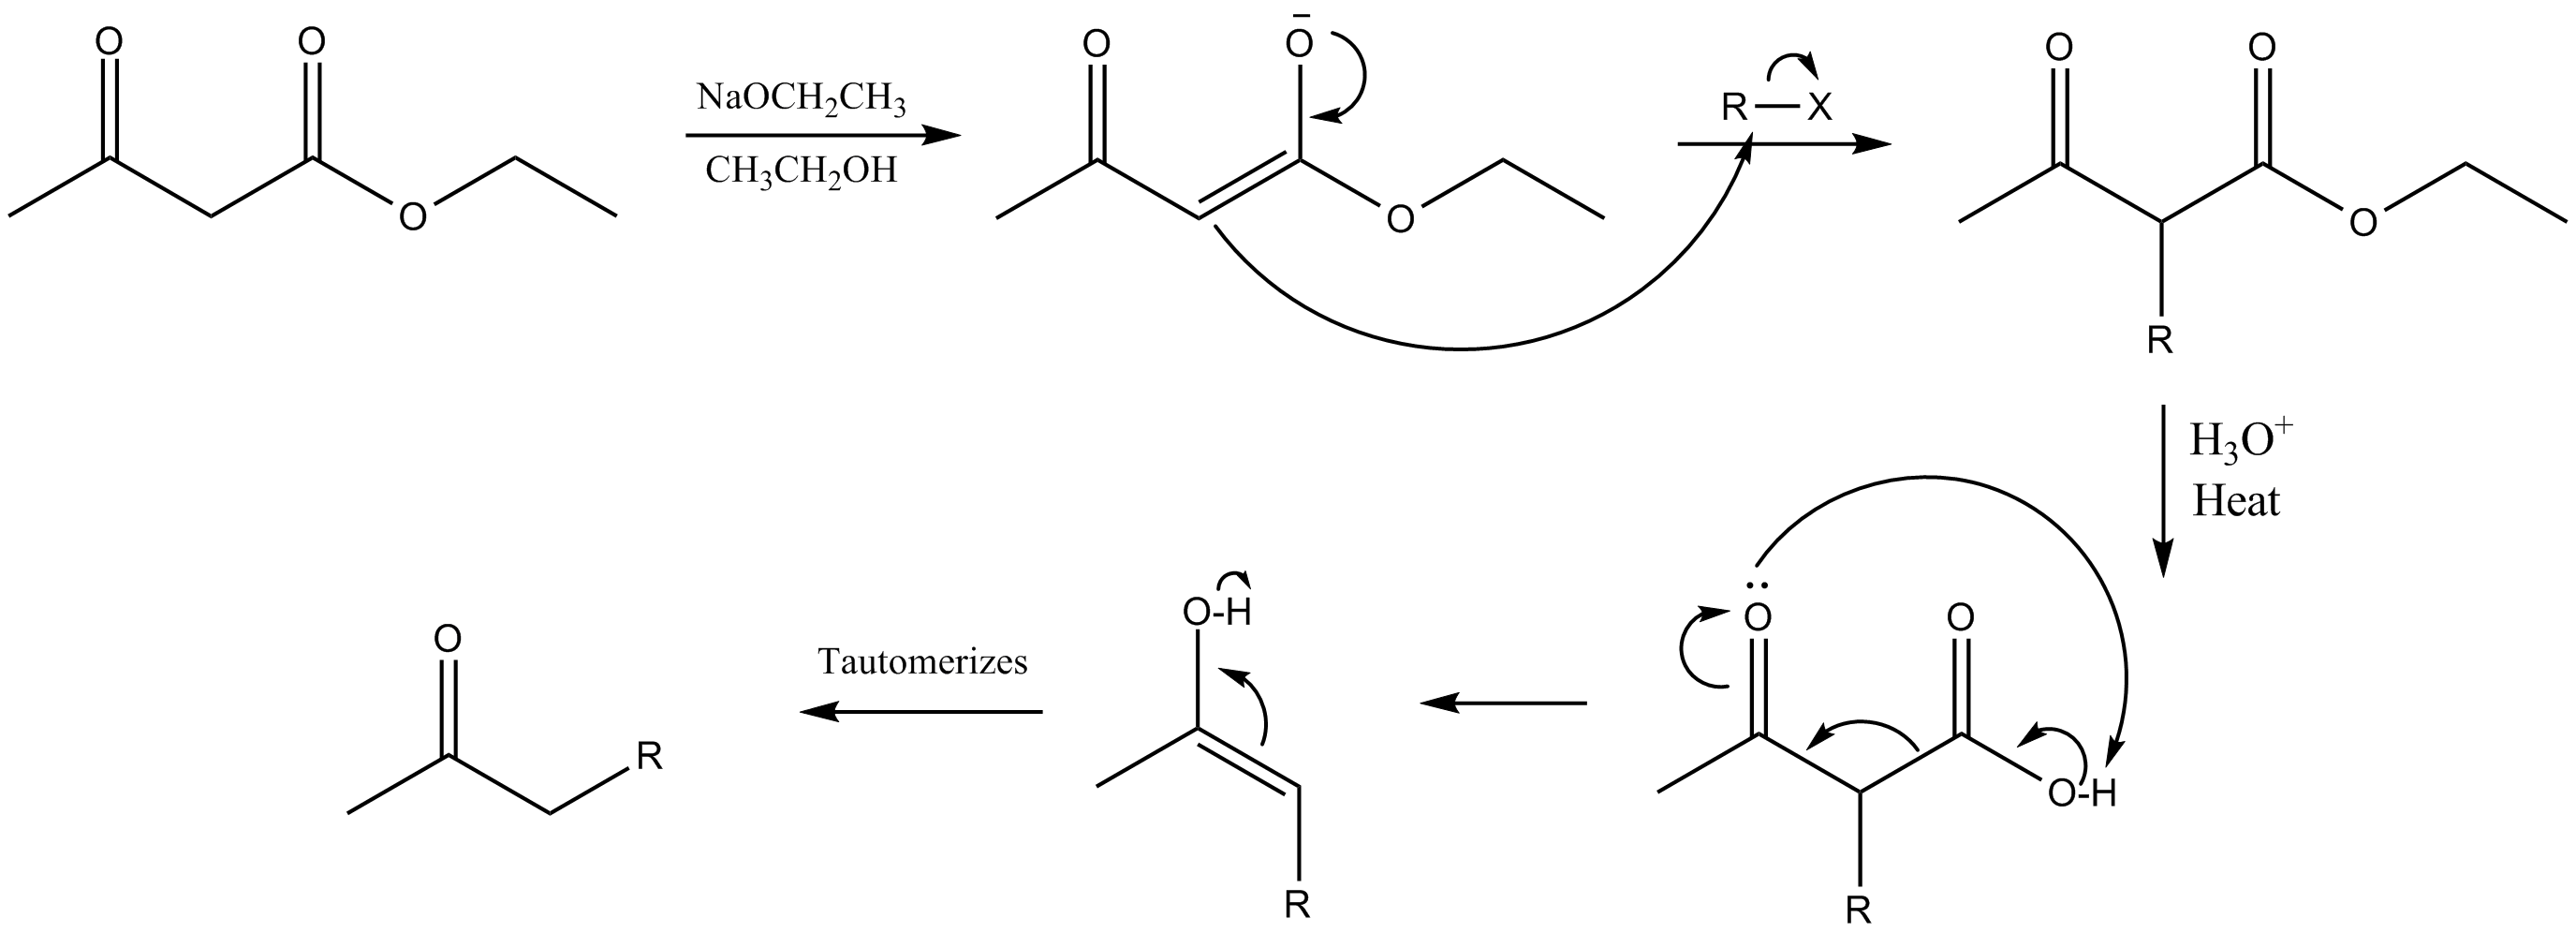 description of a mechanism Prolonged intracisternal papaverine toxicity: index case description and  proposed mechanism of action xiaofei zhou1, vilakshan alambyan2, thomas.